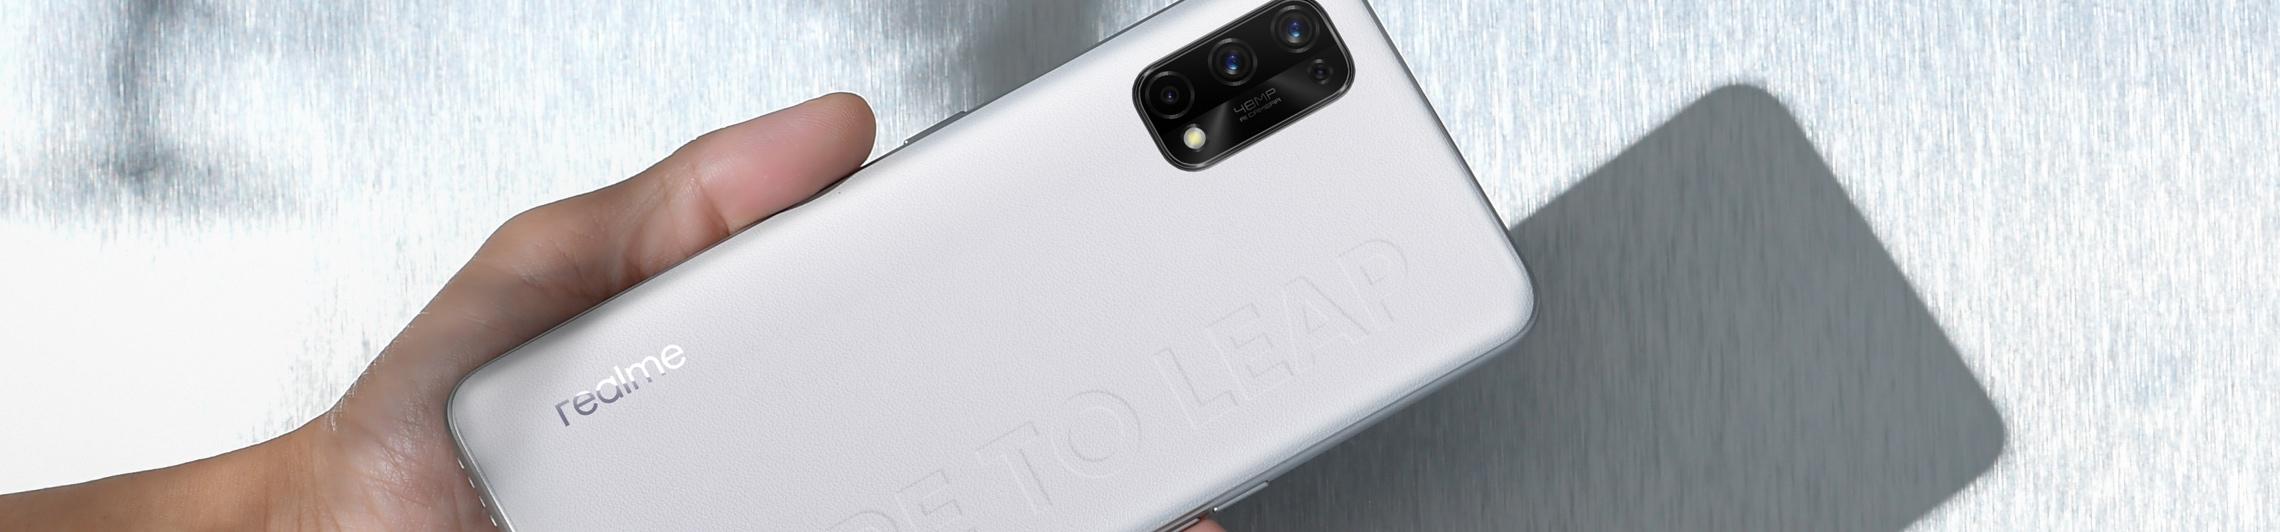 realmeQ2pro和荣耀X10哪个好?参数对比怎么样?